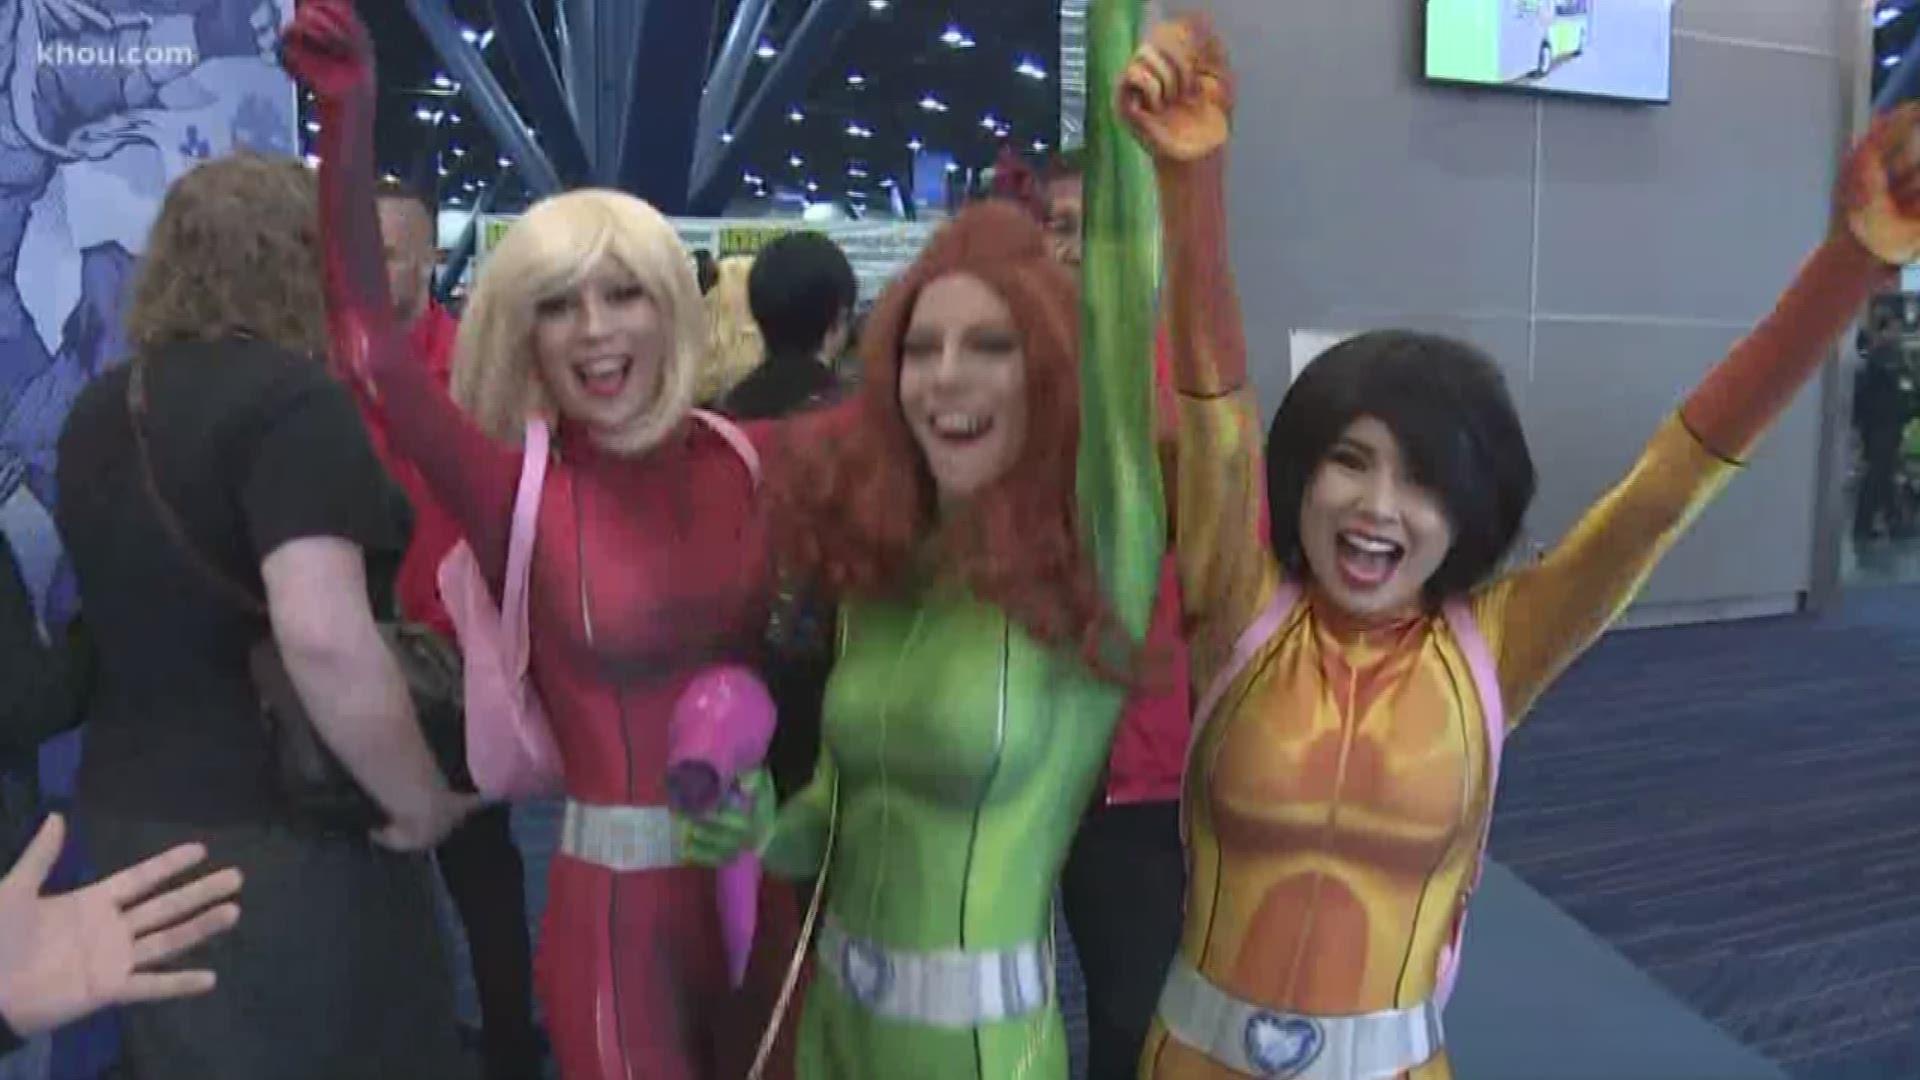 Halloween 2020 Houston Comicpalooza in Houston canceled because of coronavirus   khou.com